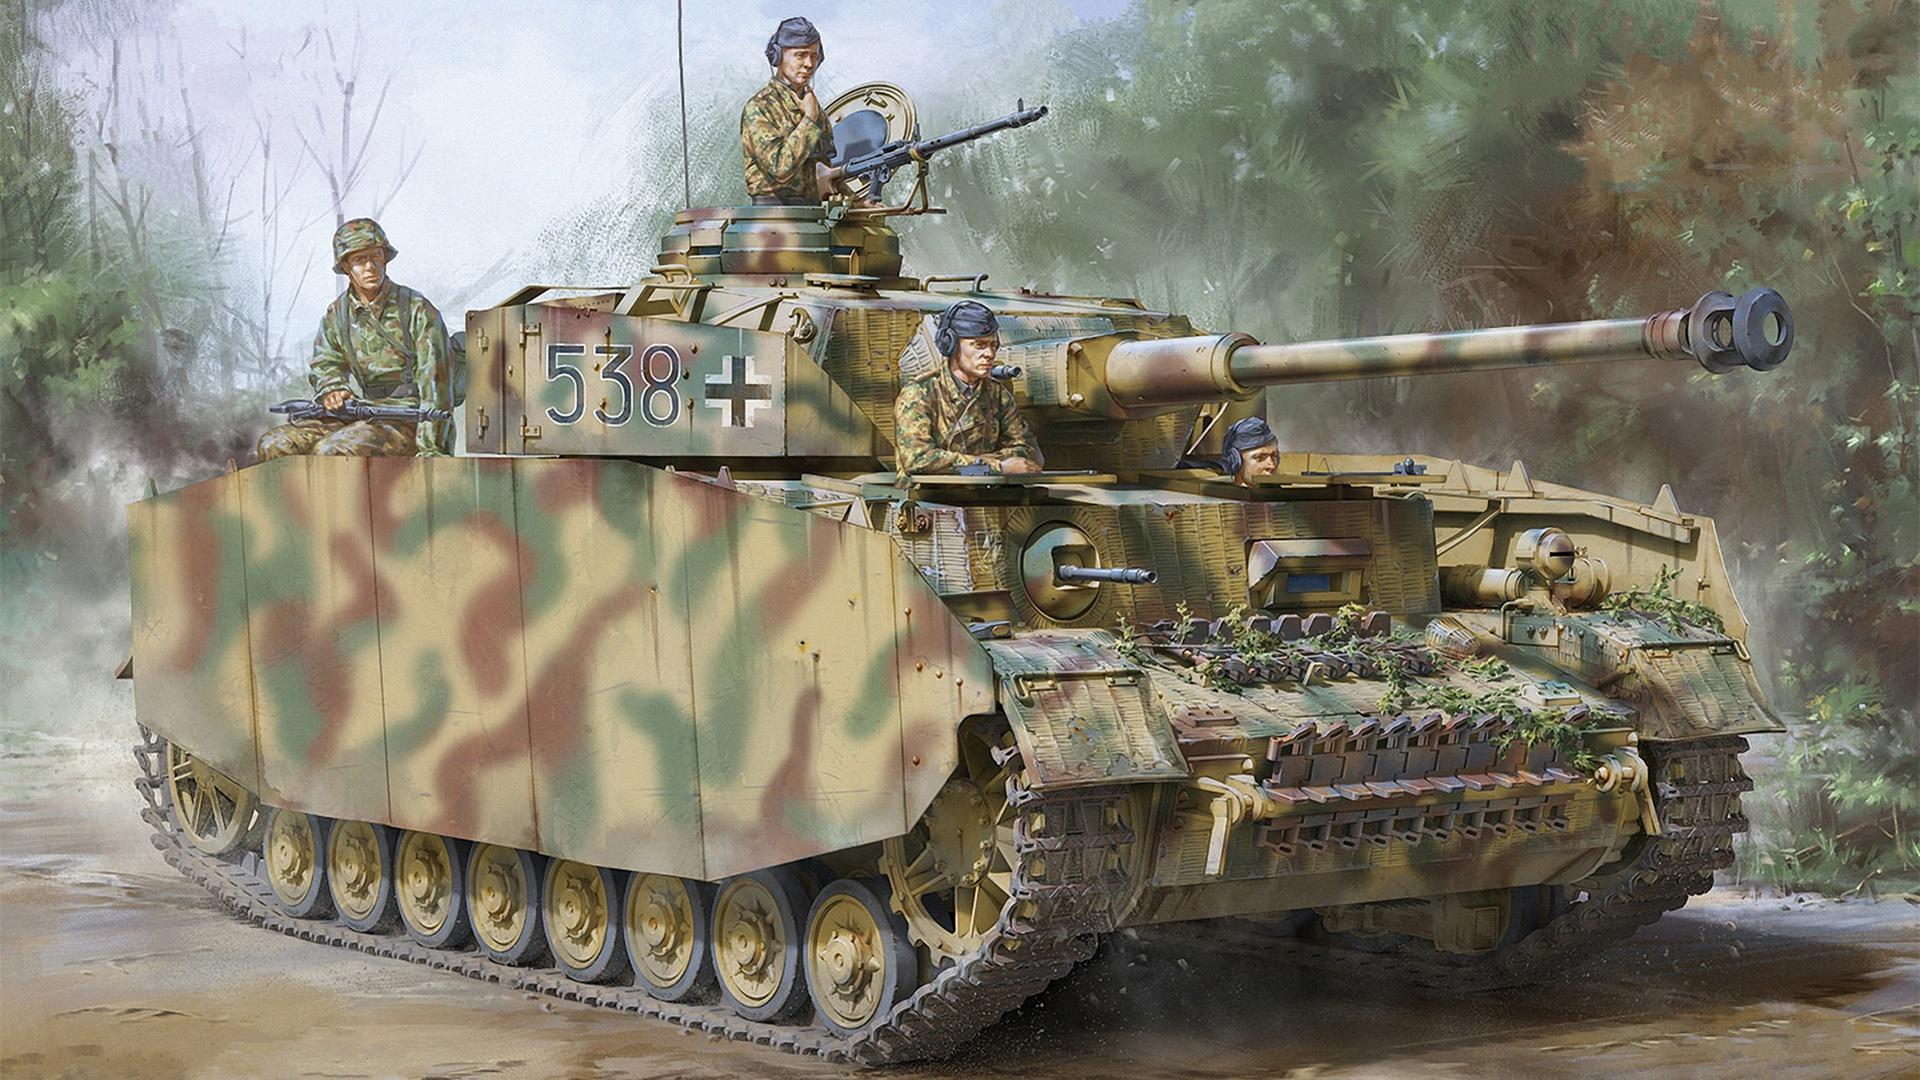 Wallpaper A IV, Panzerkampfwagen IV, Pz. IV, medium tank